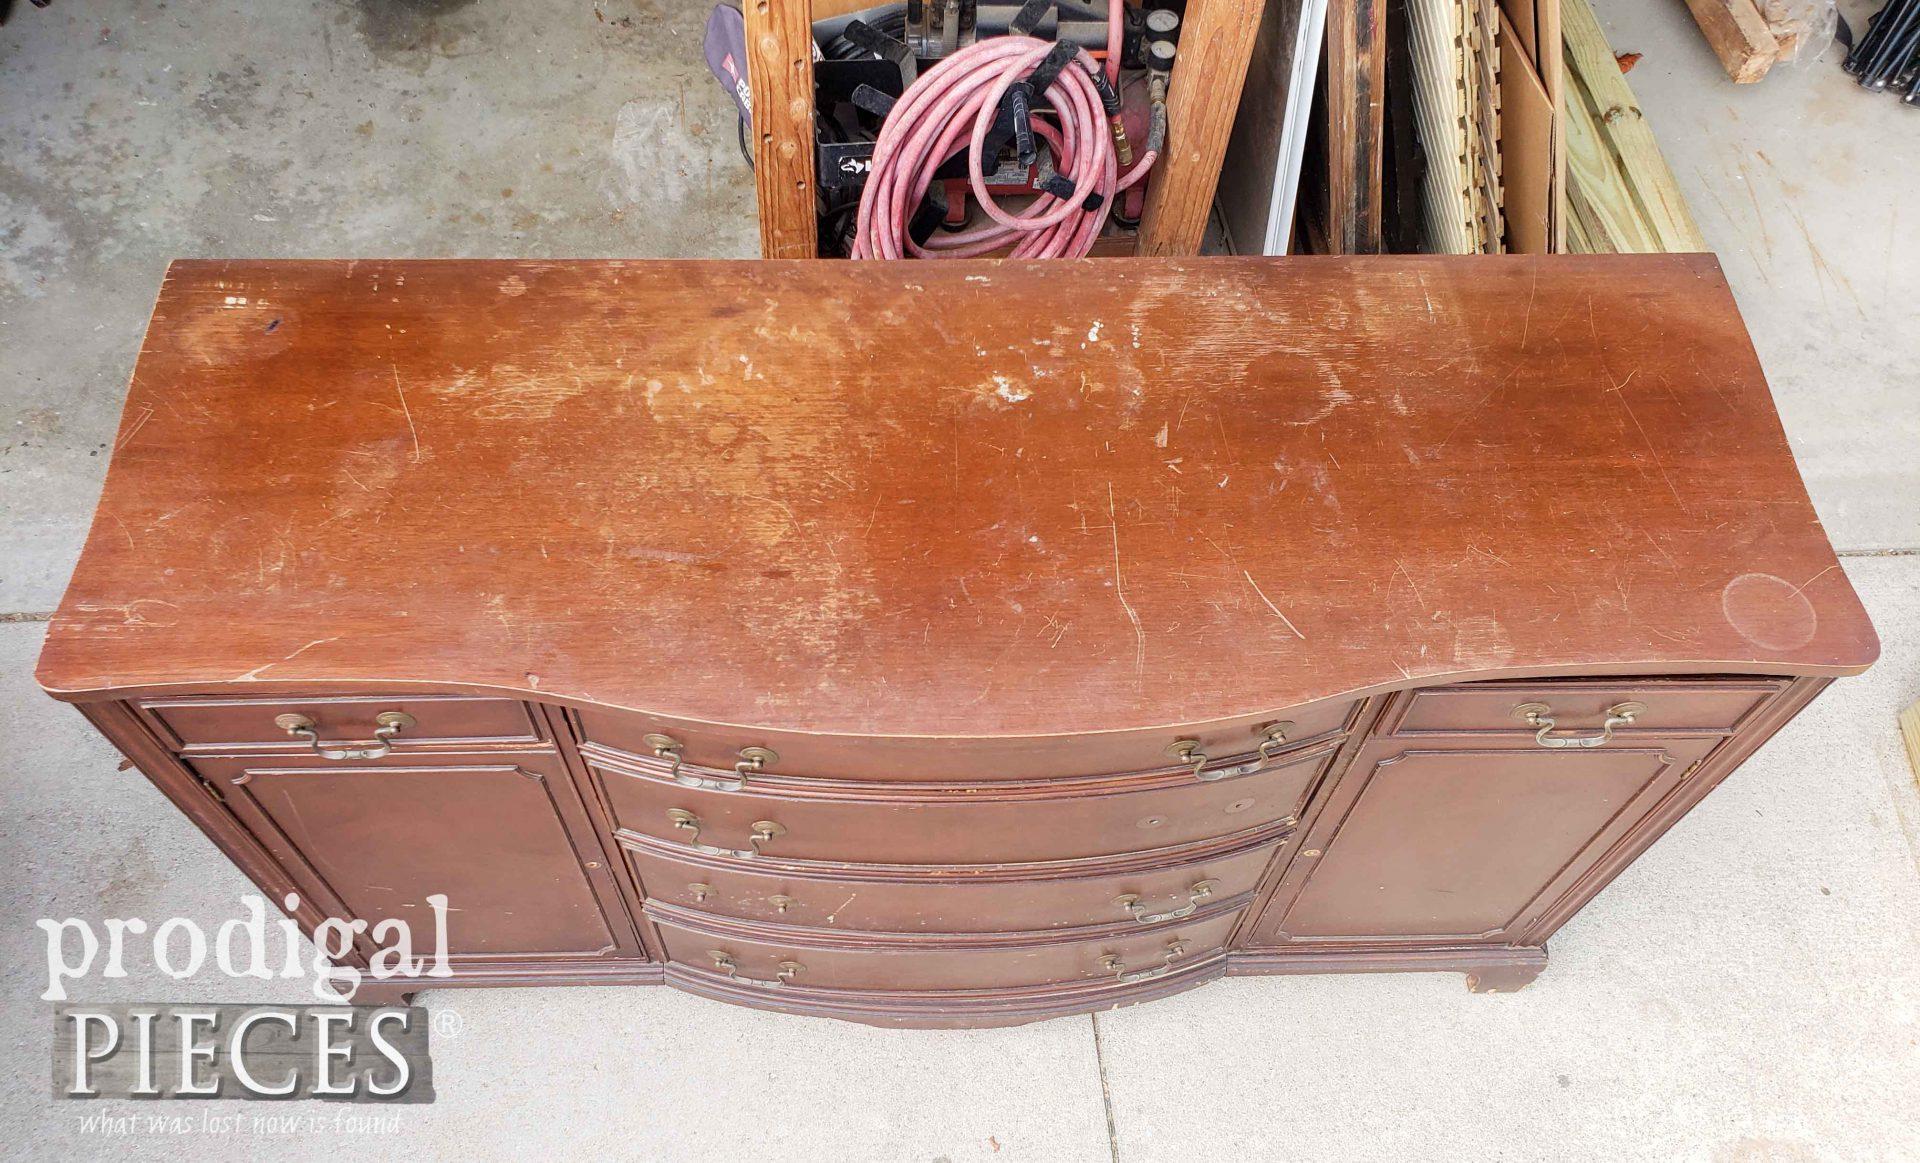 Damaged Vintage Buffet Top | prodigalpieces.com